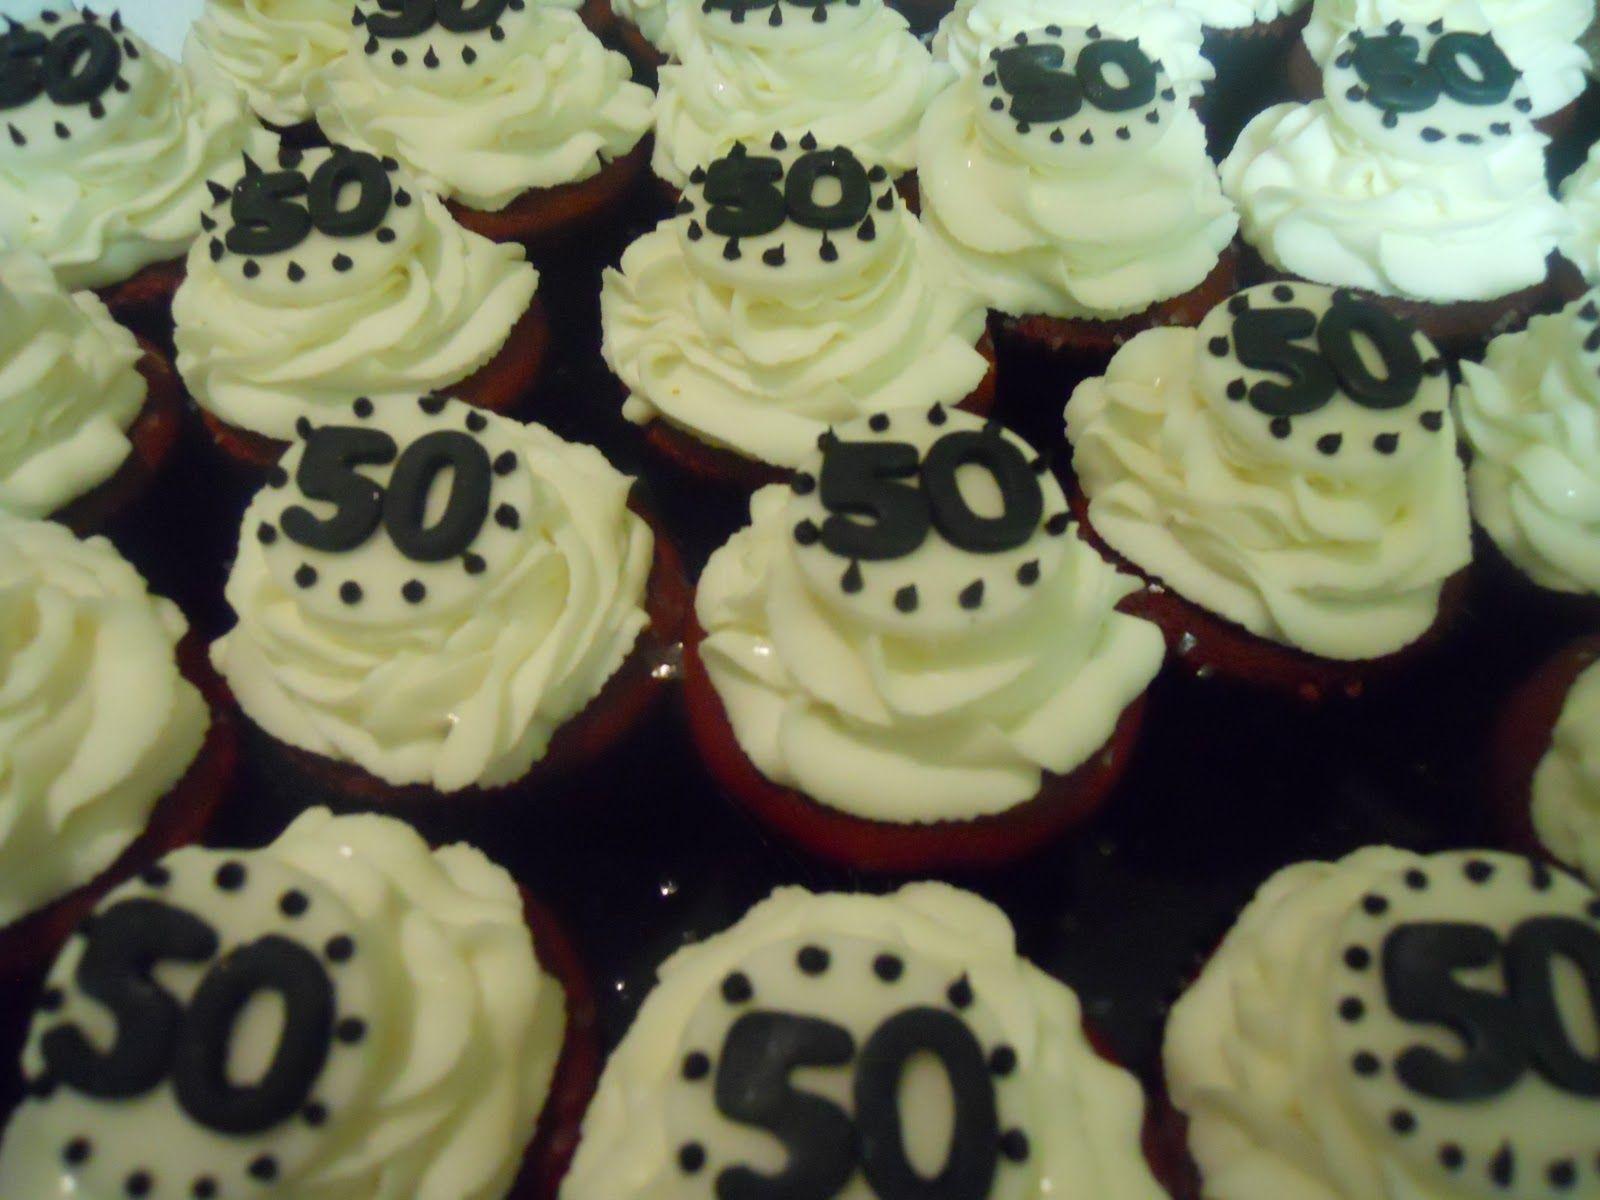 50th birthday cupcake ideas 50th Birthday Sweet treats